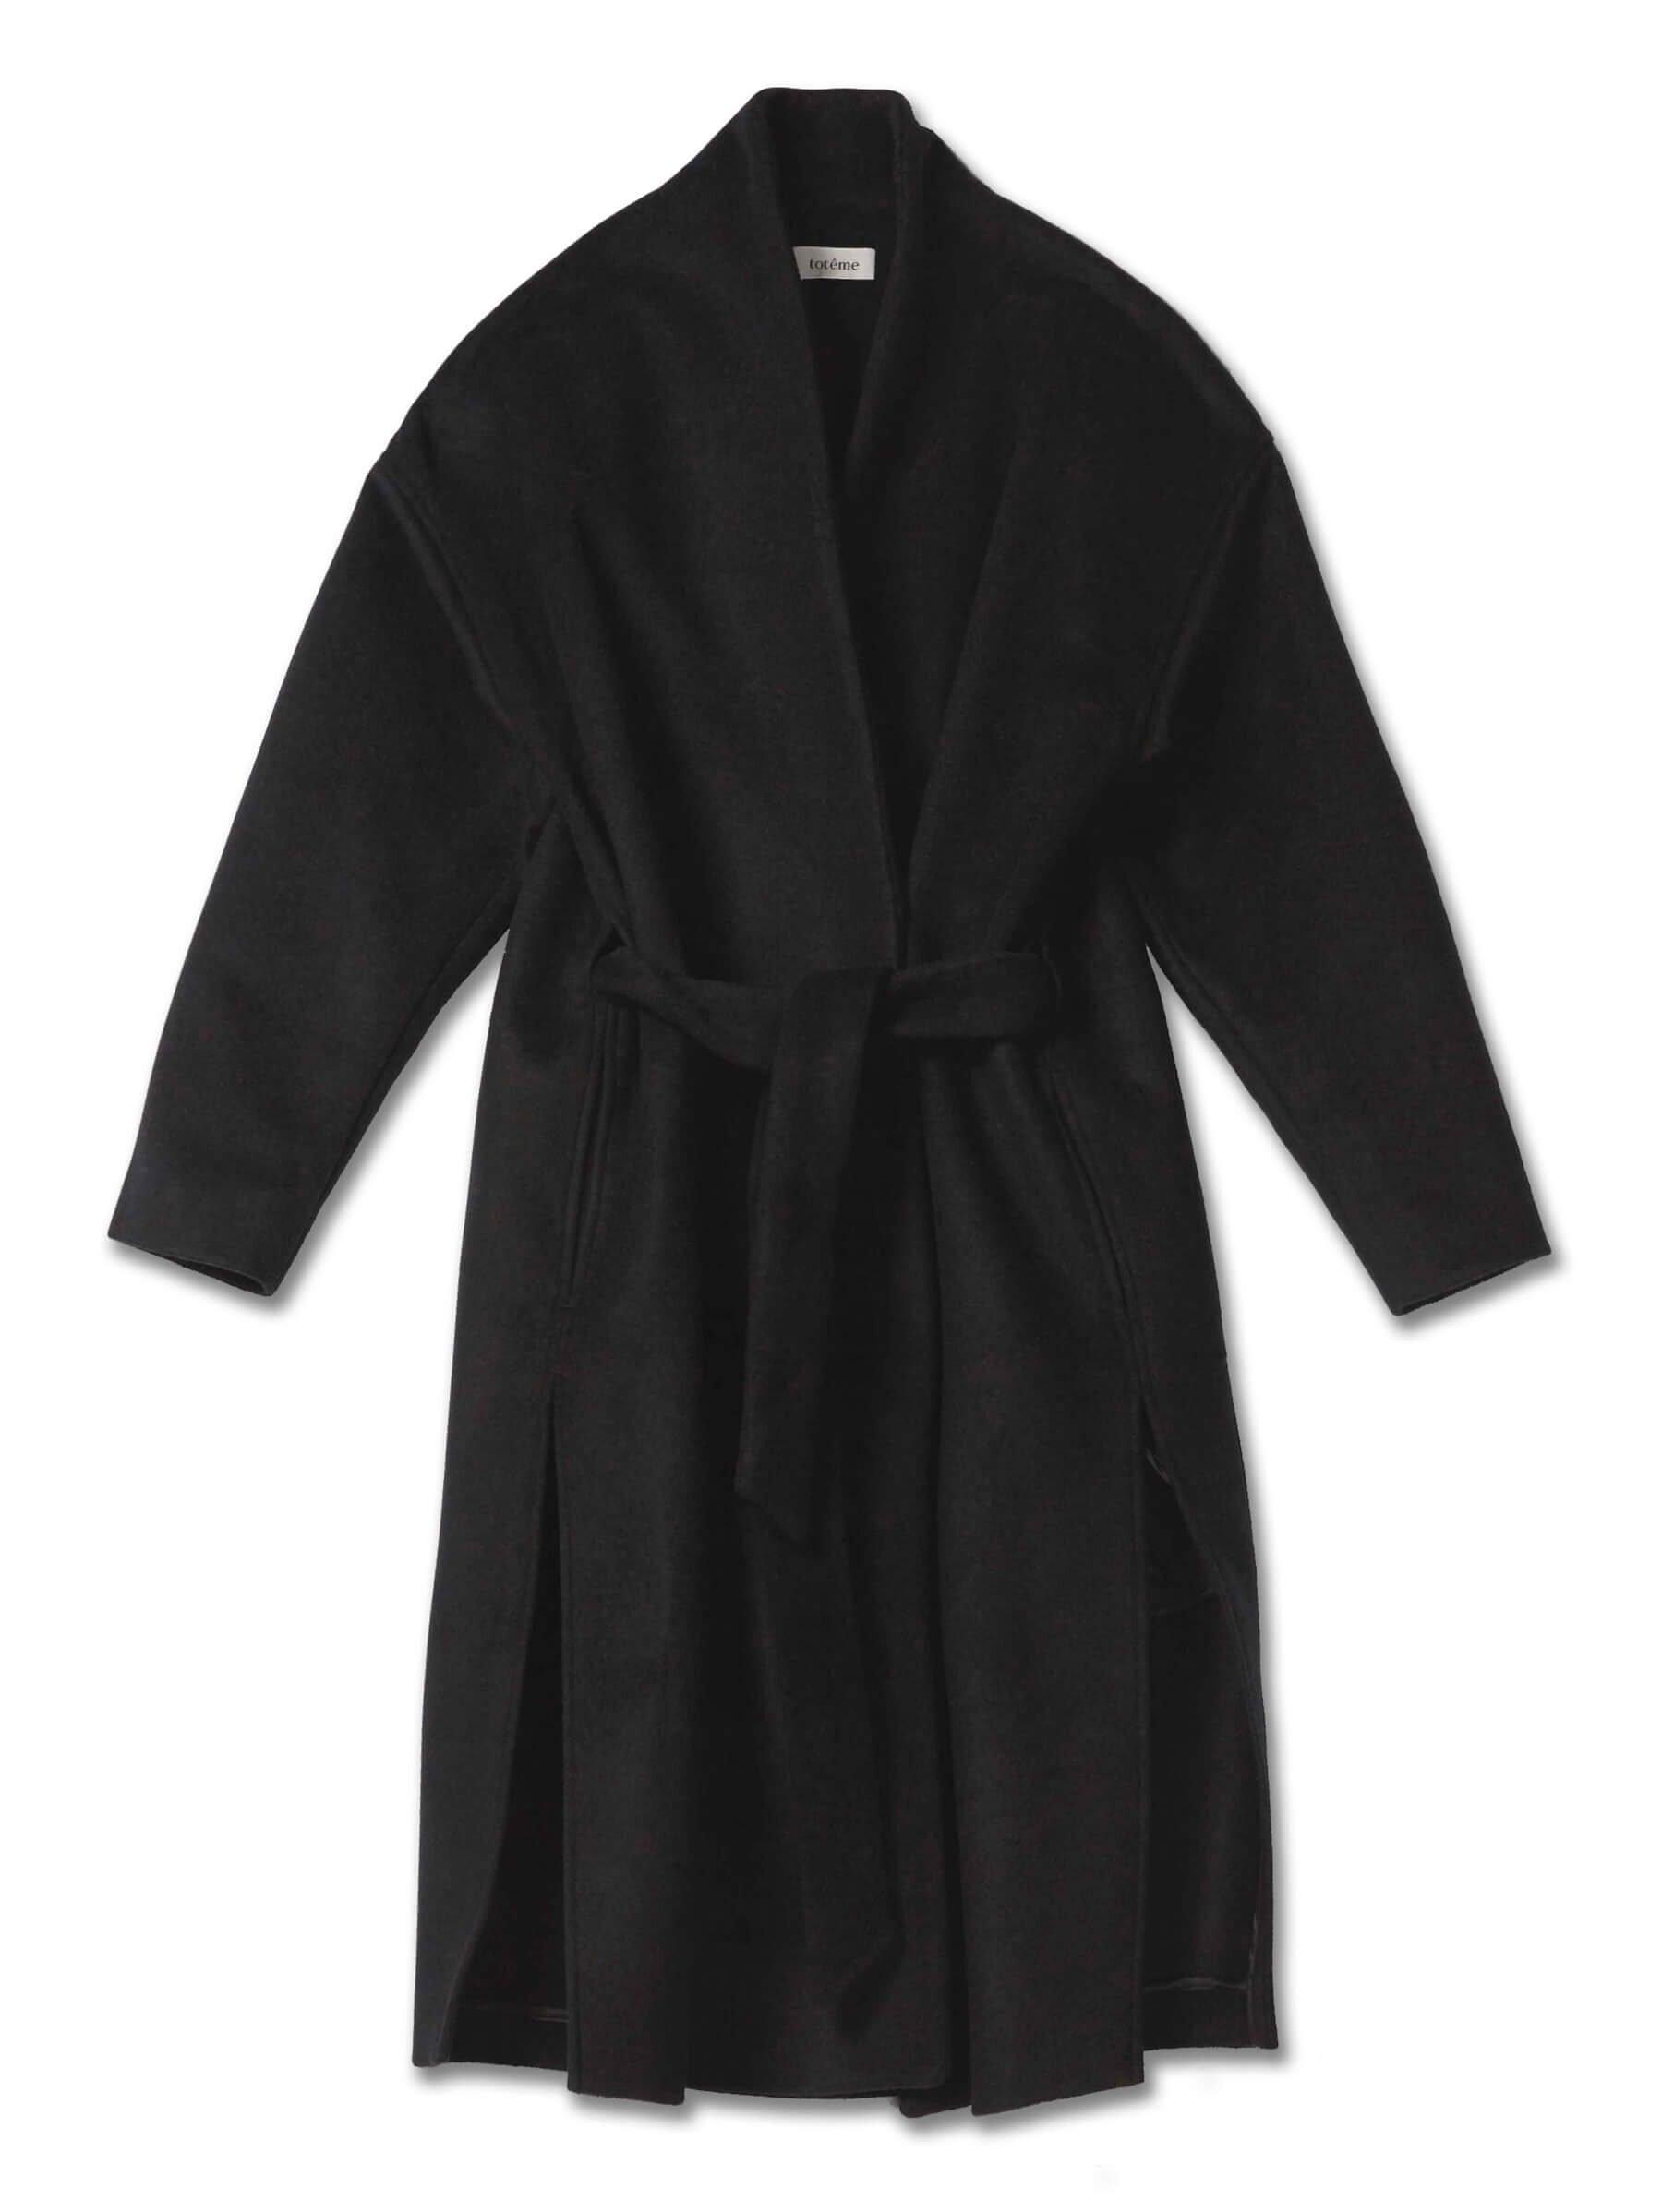 toteme_chelsea_coat_black-1800x2396.jpeg